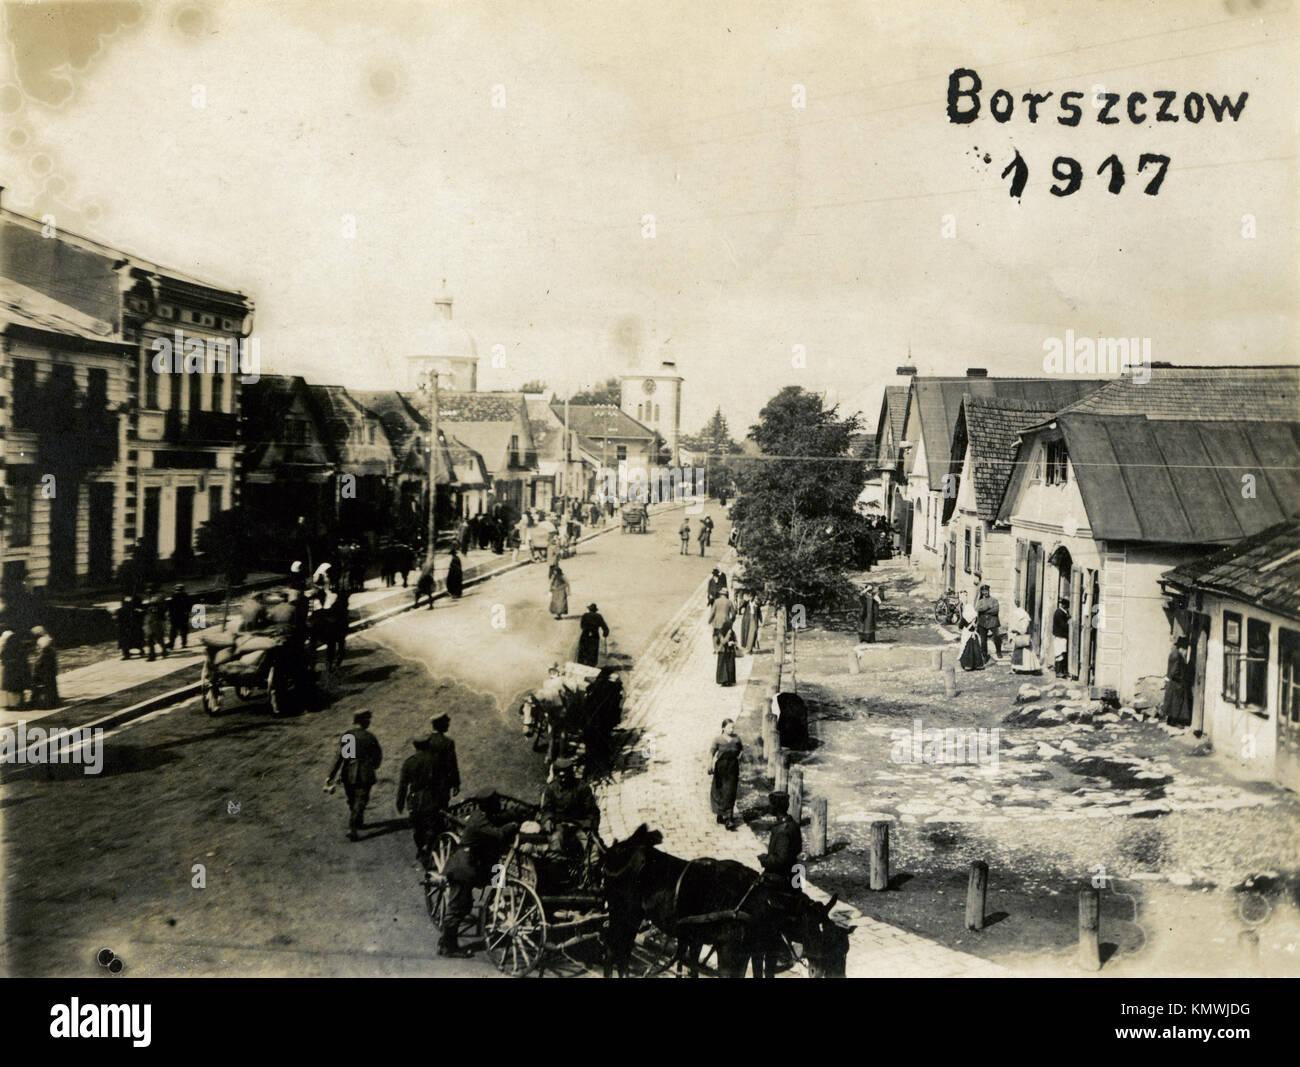 An antique postcard of Borszczow, Ukraine - Stock Image